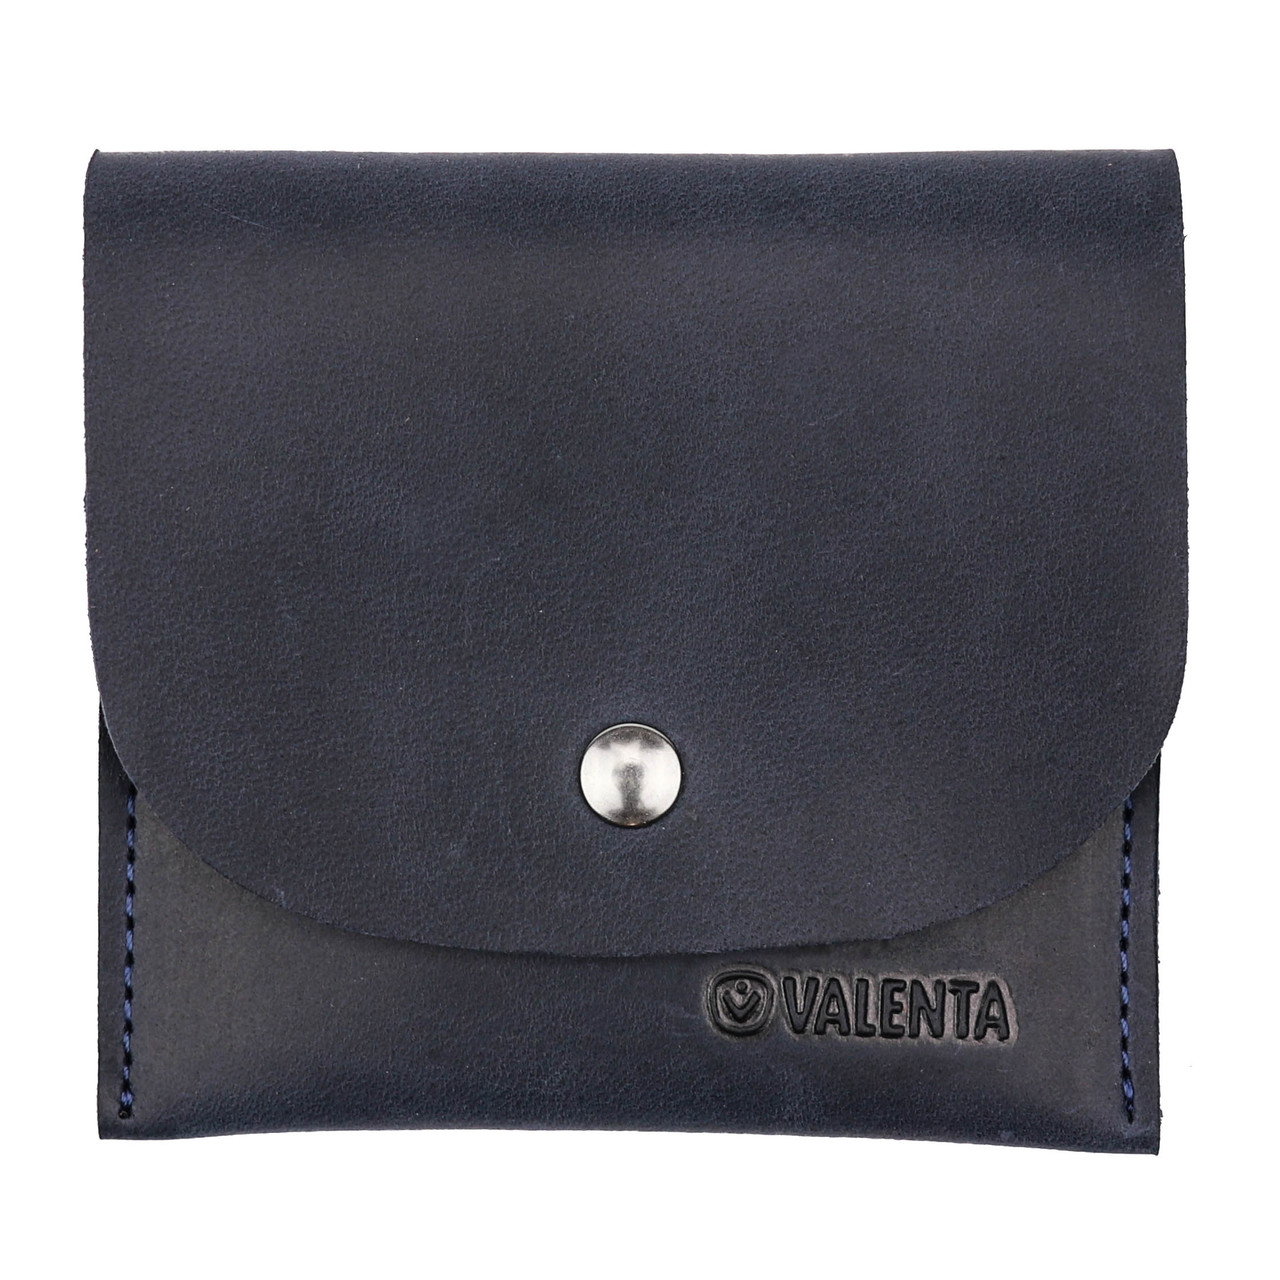 Маленький кошелек Valenta Encore Синий (ХР23062h)